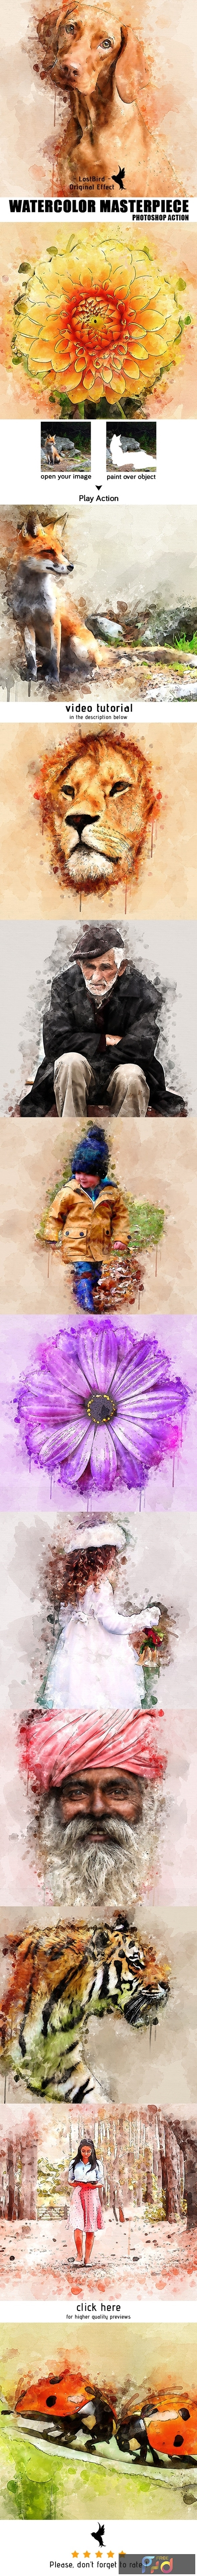 Watercolor Masterpiece - Photoshop Action 22921333 1